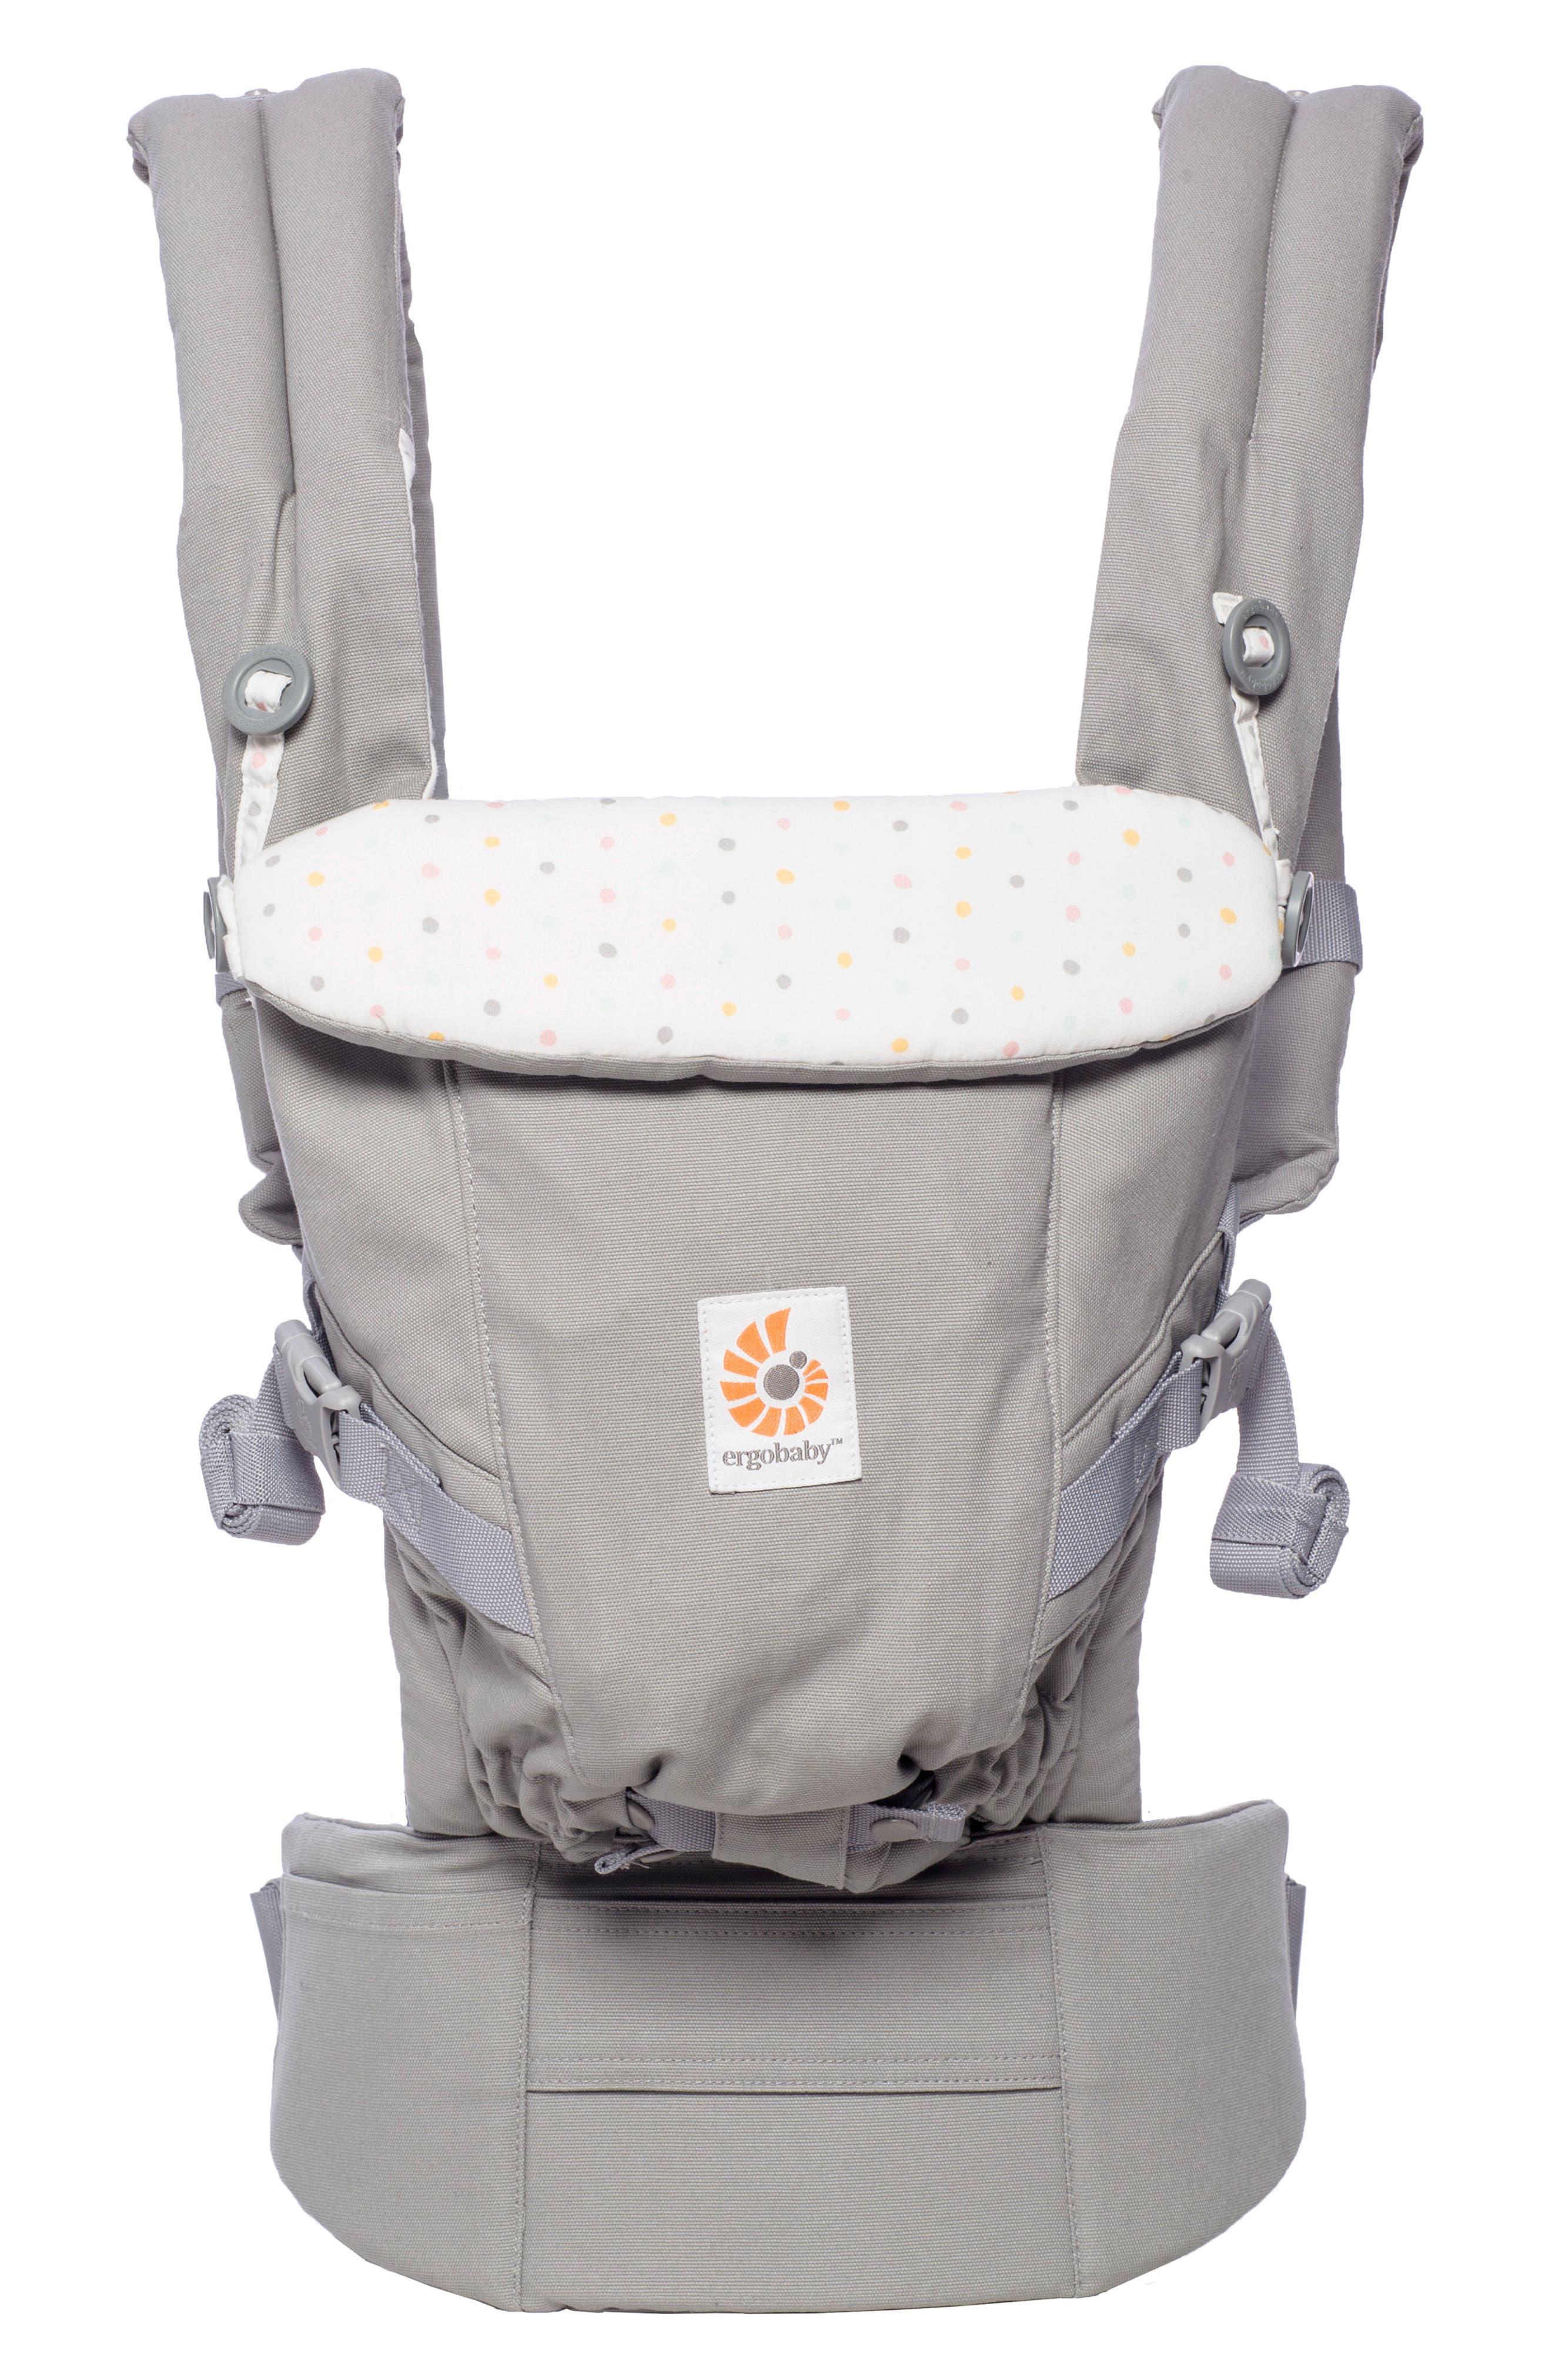 Main Image - ERGObaby Three Position ADAPT Baby Carrier